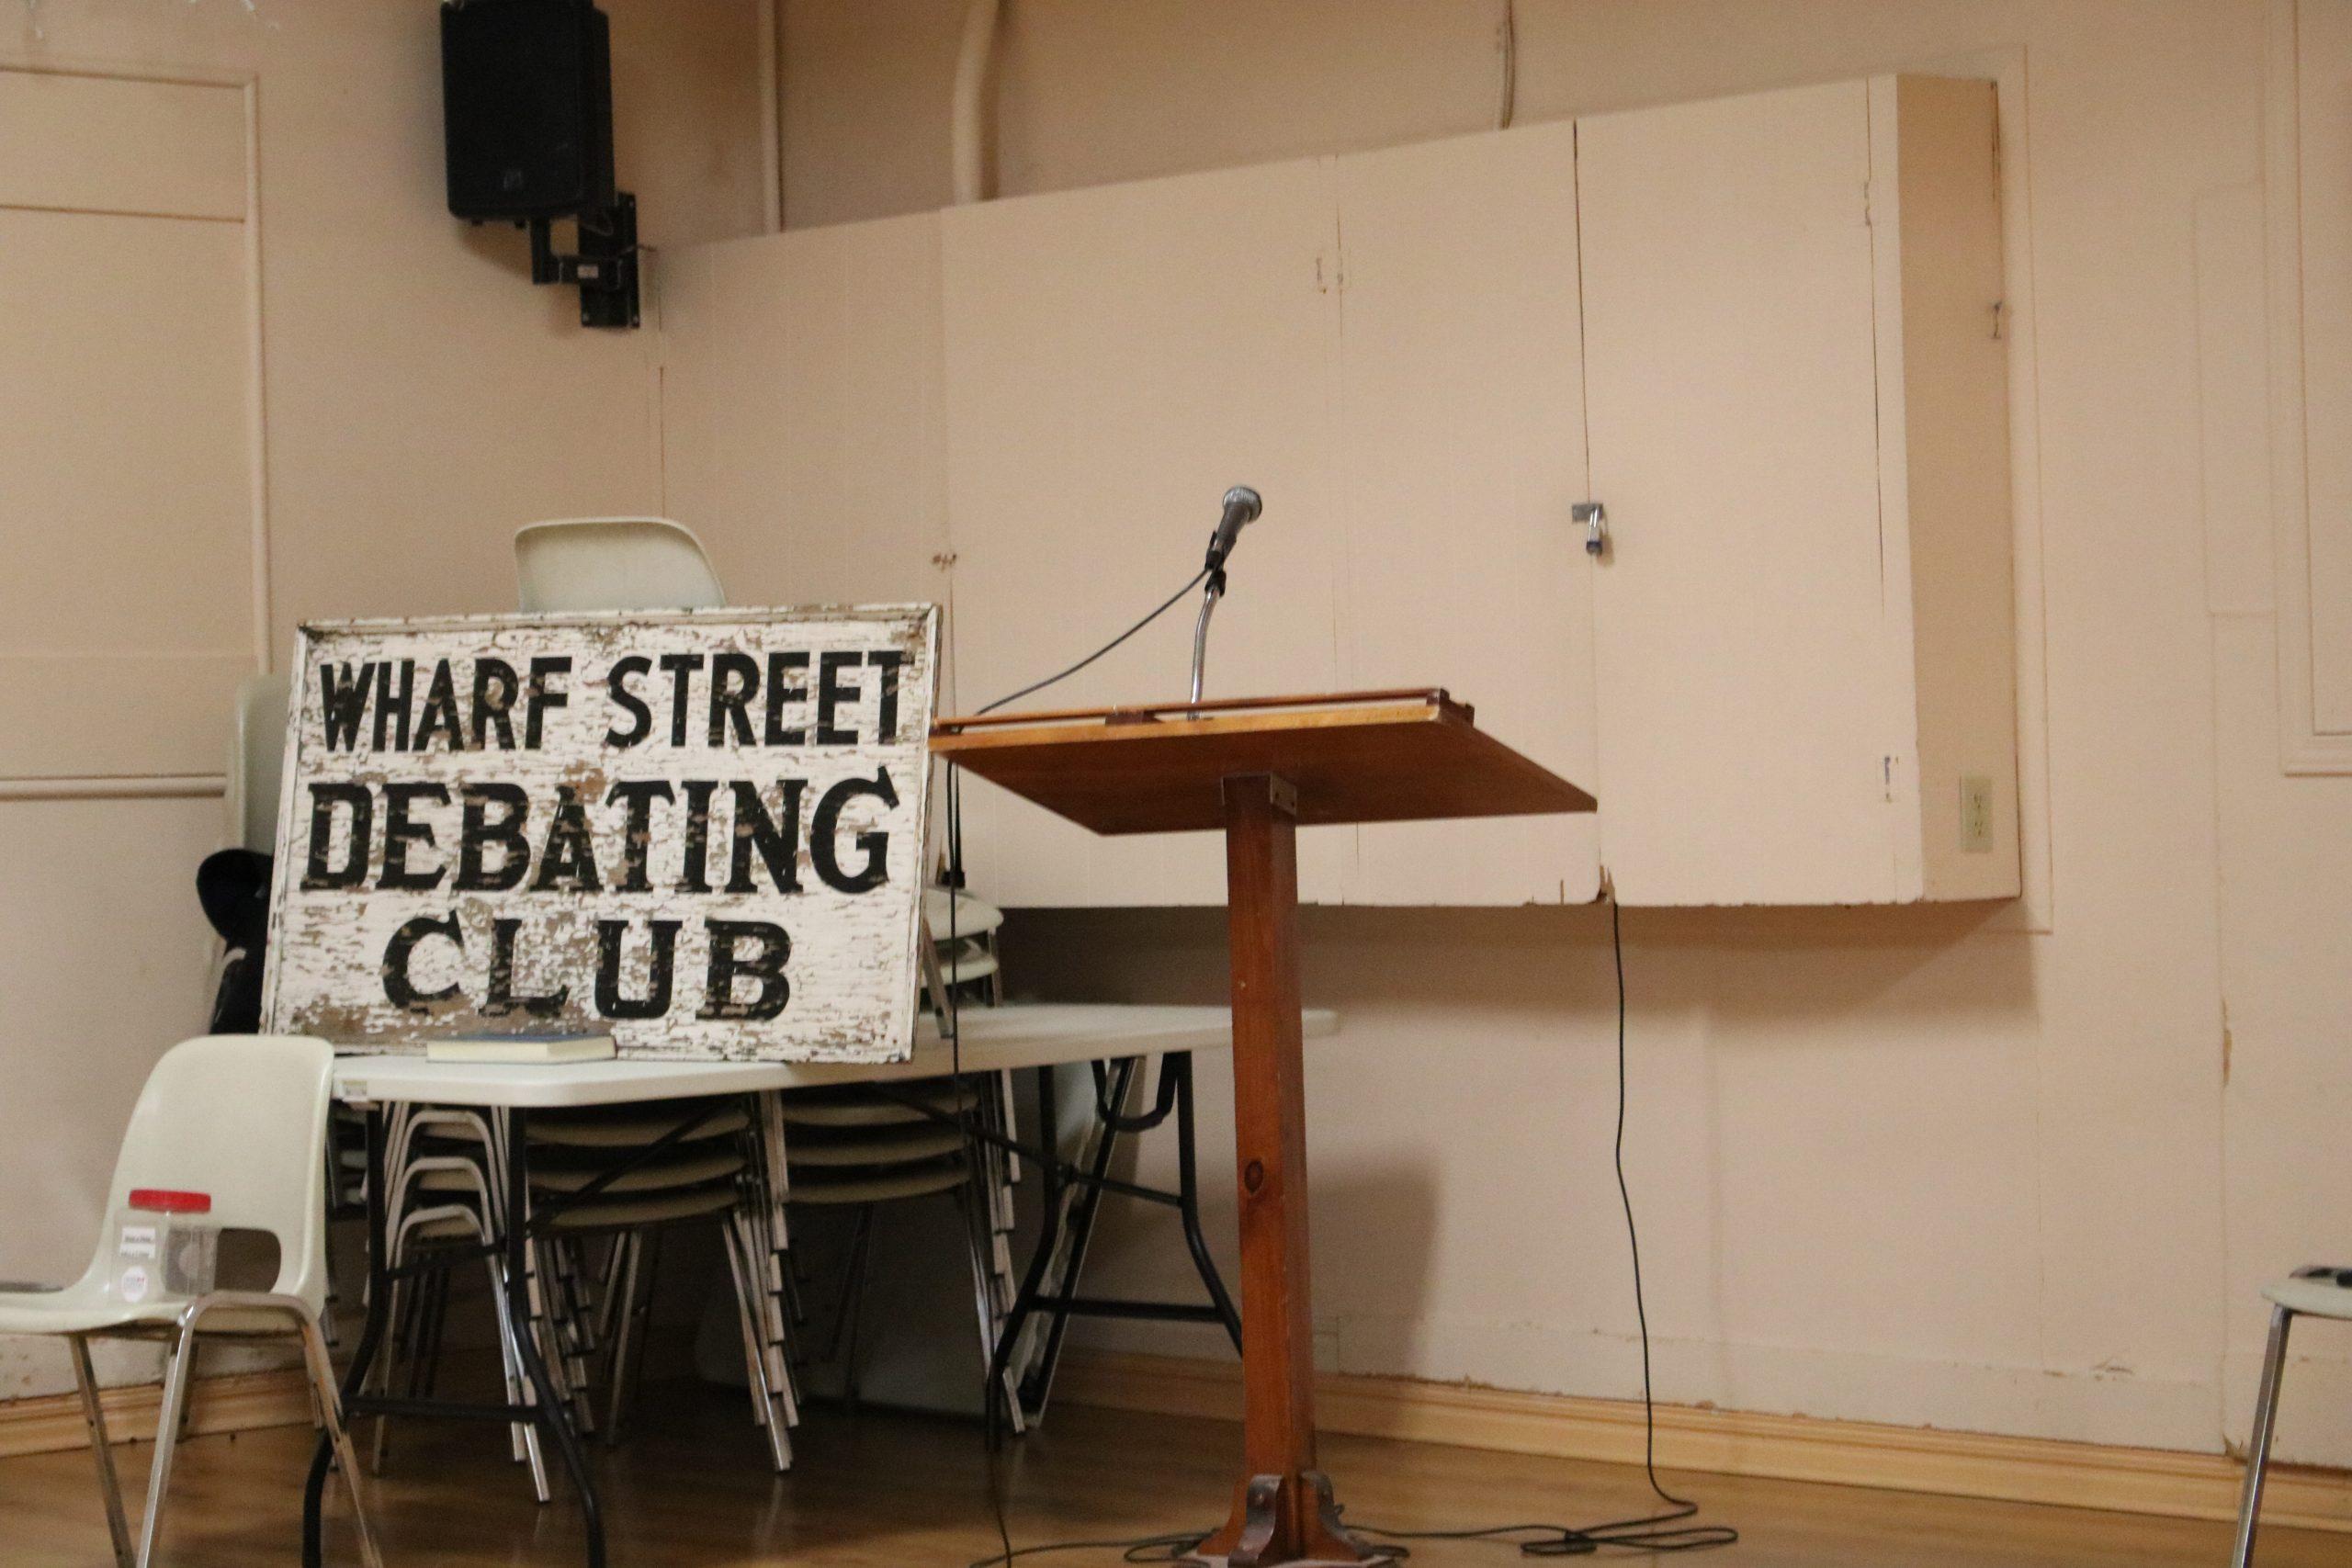 Candidates trade jabs at 103rd Wharf Street Debate